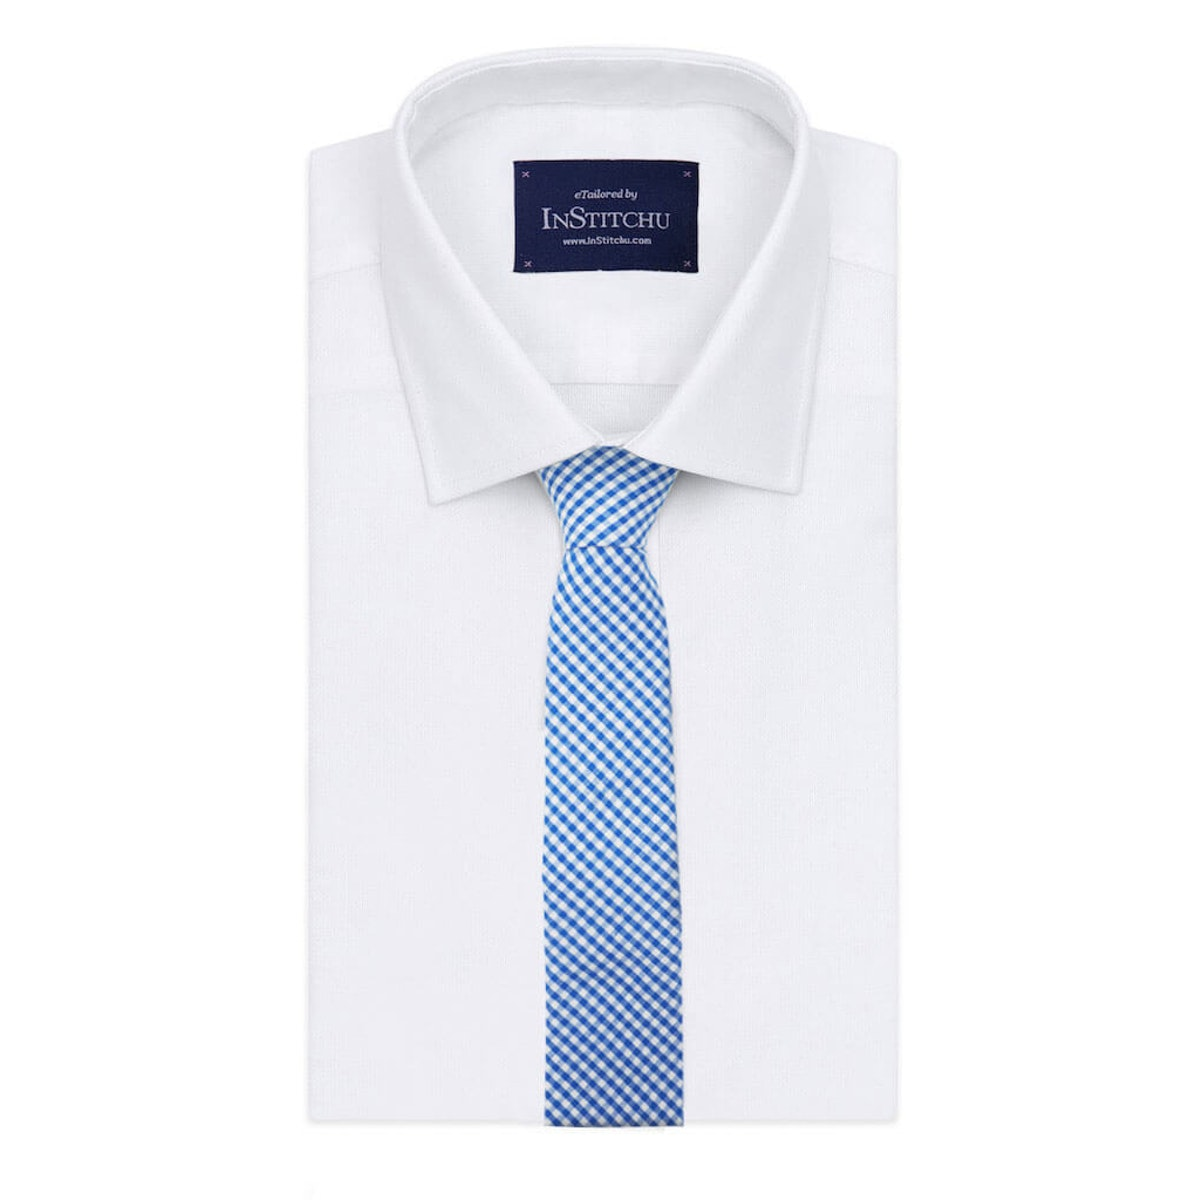 InStitchu Essentials Accessories The Dante Blue Gingham Cotton Tie on shirt